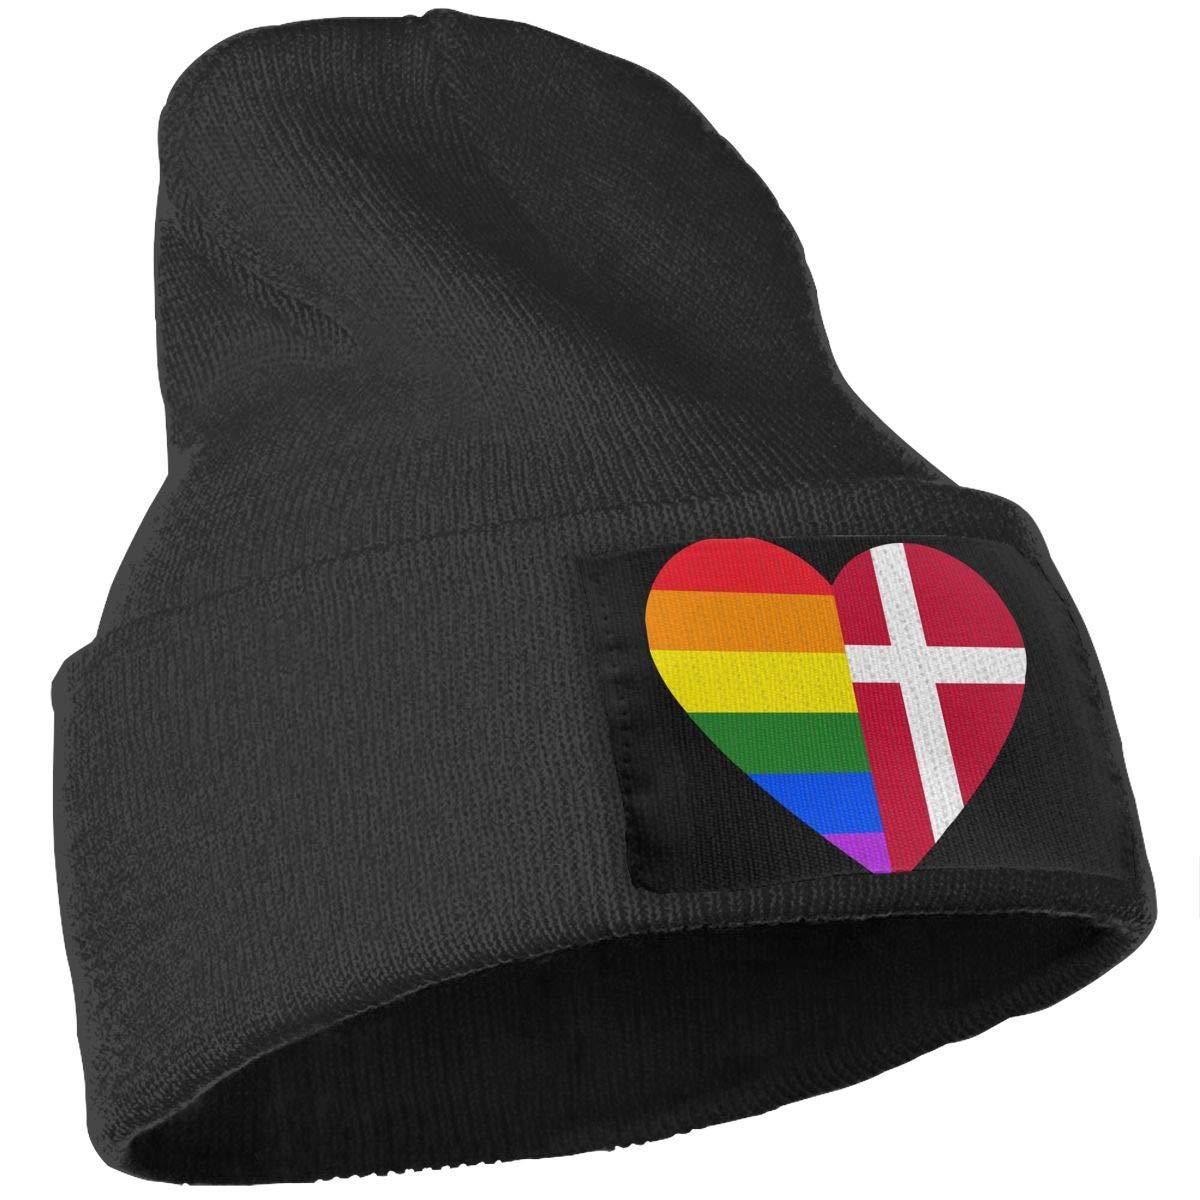 Denmark Flag Unisex Solid Color Knit Beanie Hat Stretchy /& Soft Winter Ski Skull Cap